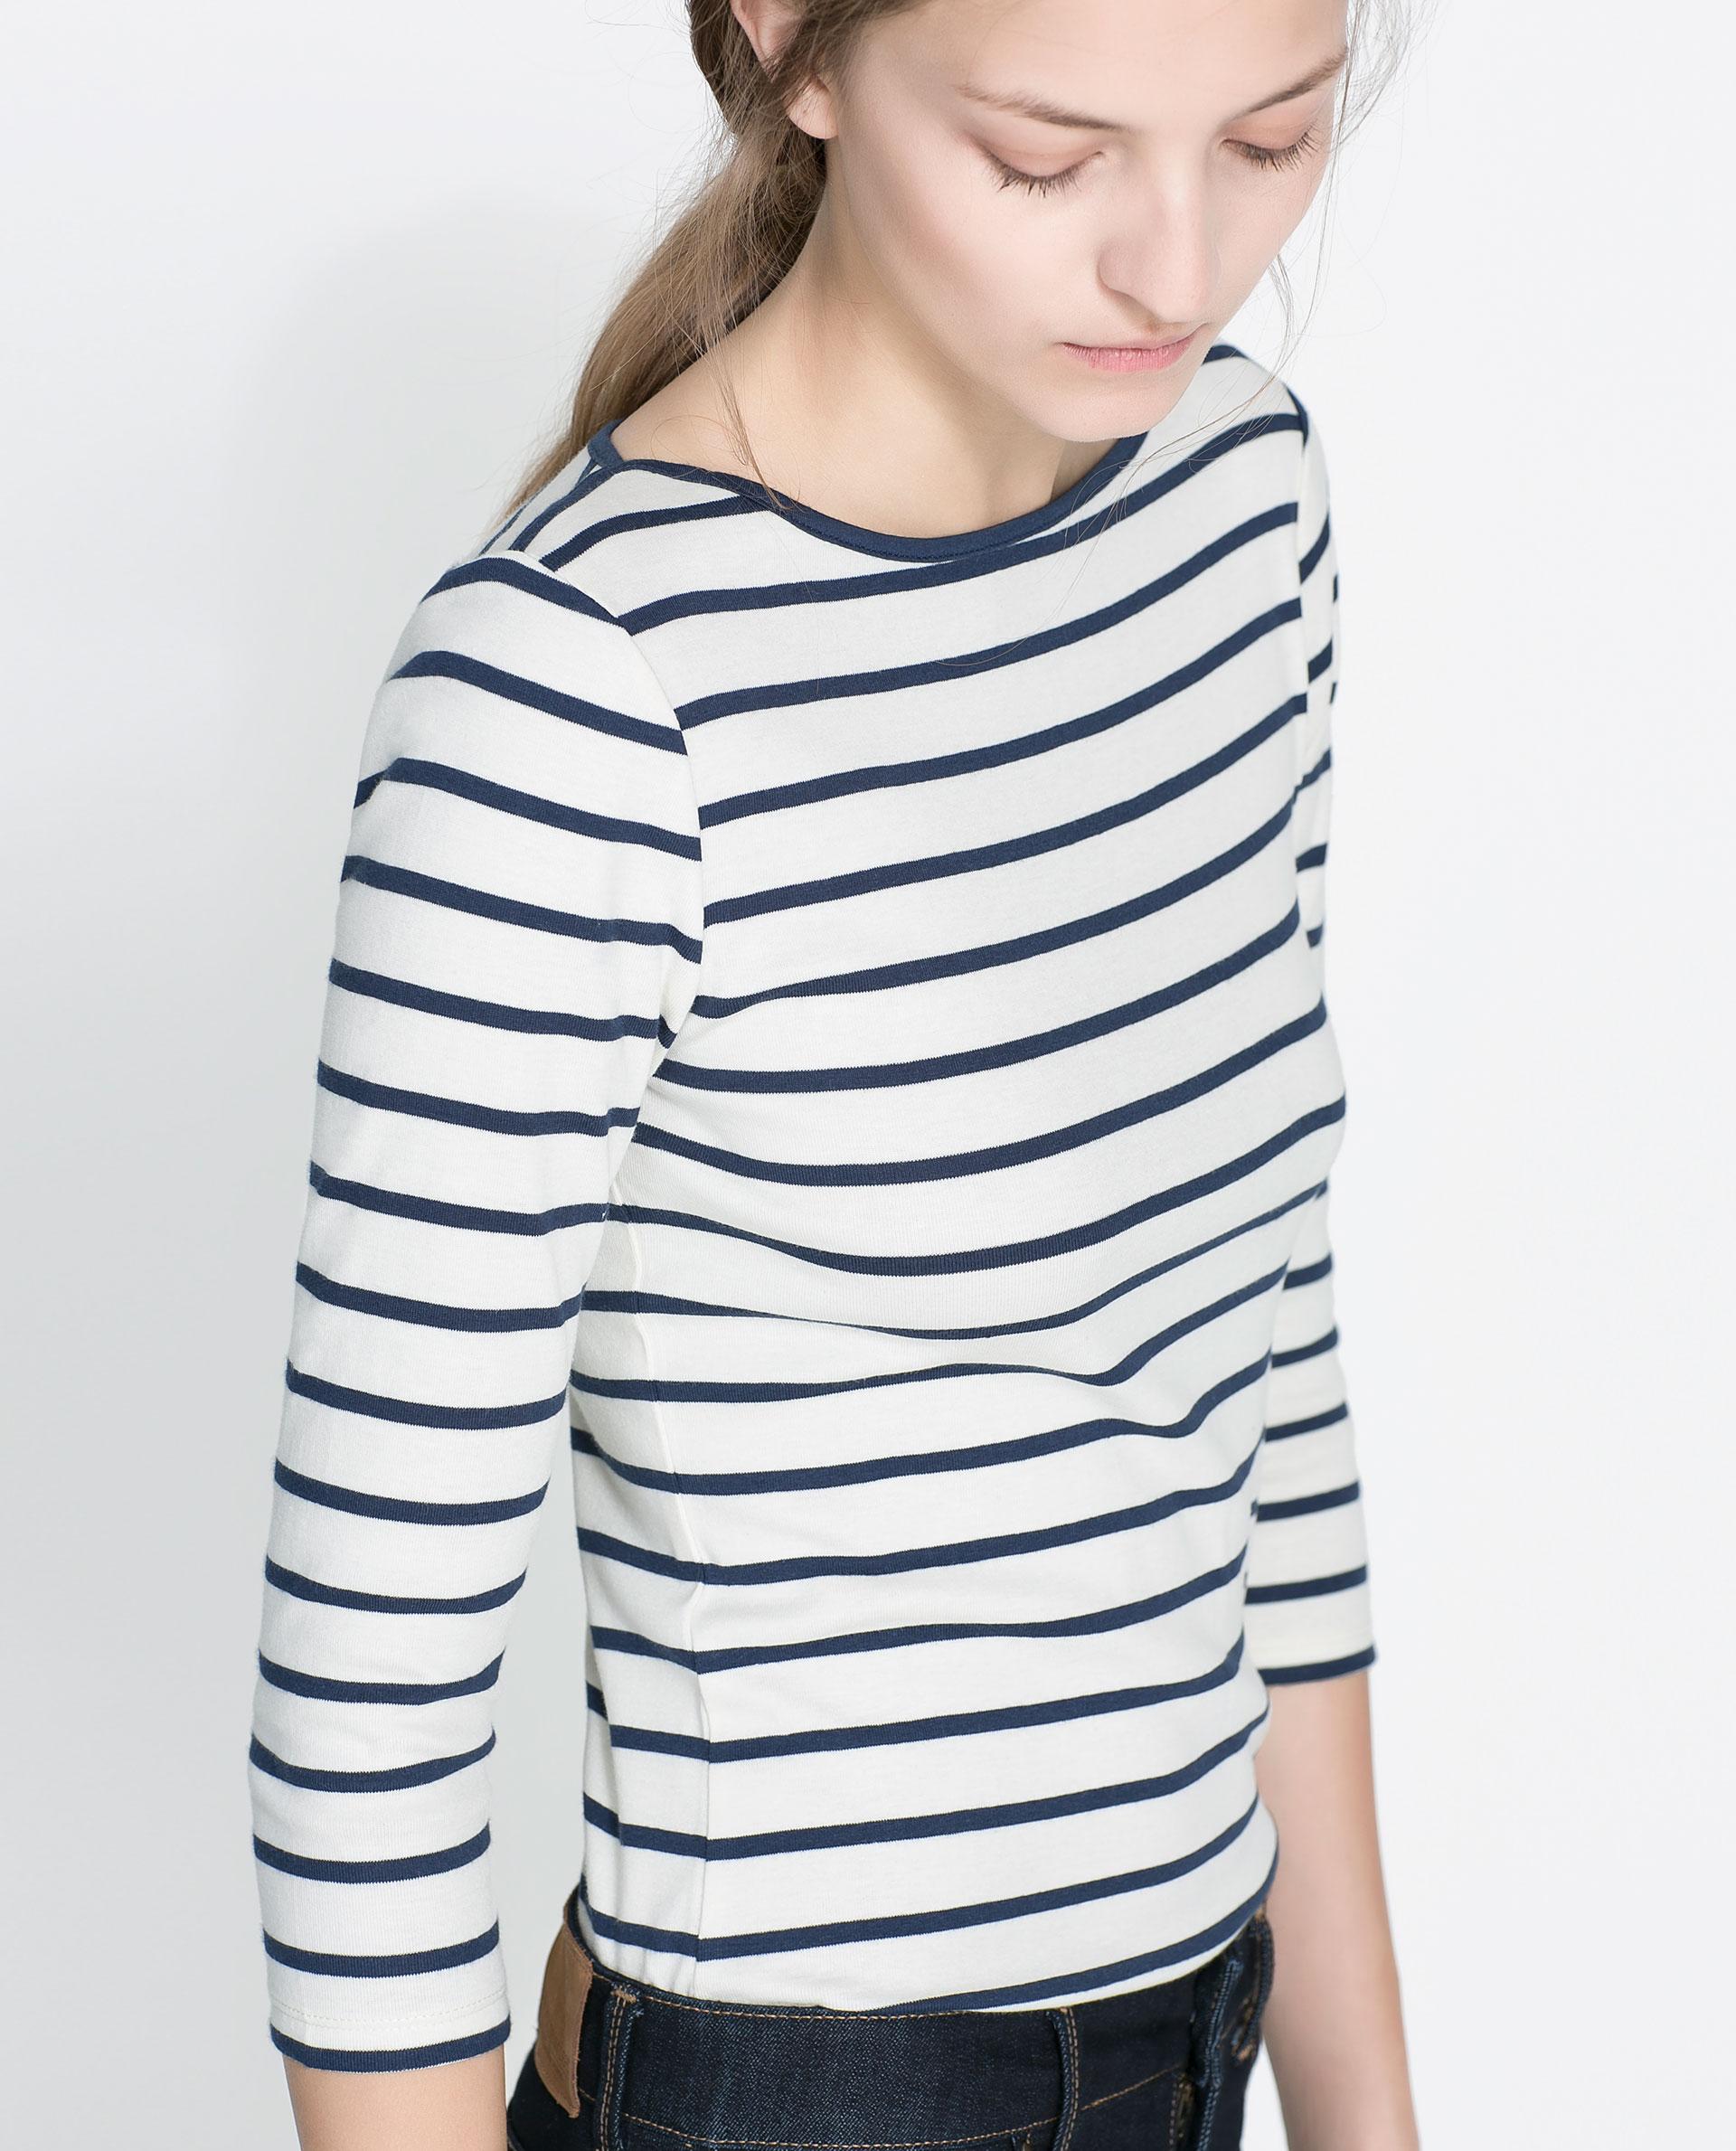 Zara Organic Cotton Striped T Shirt In Blue Ecru Navy